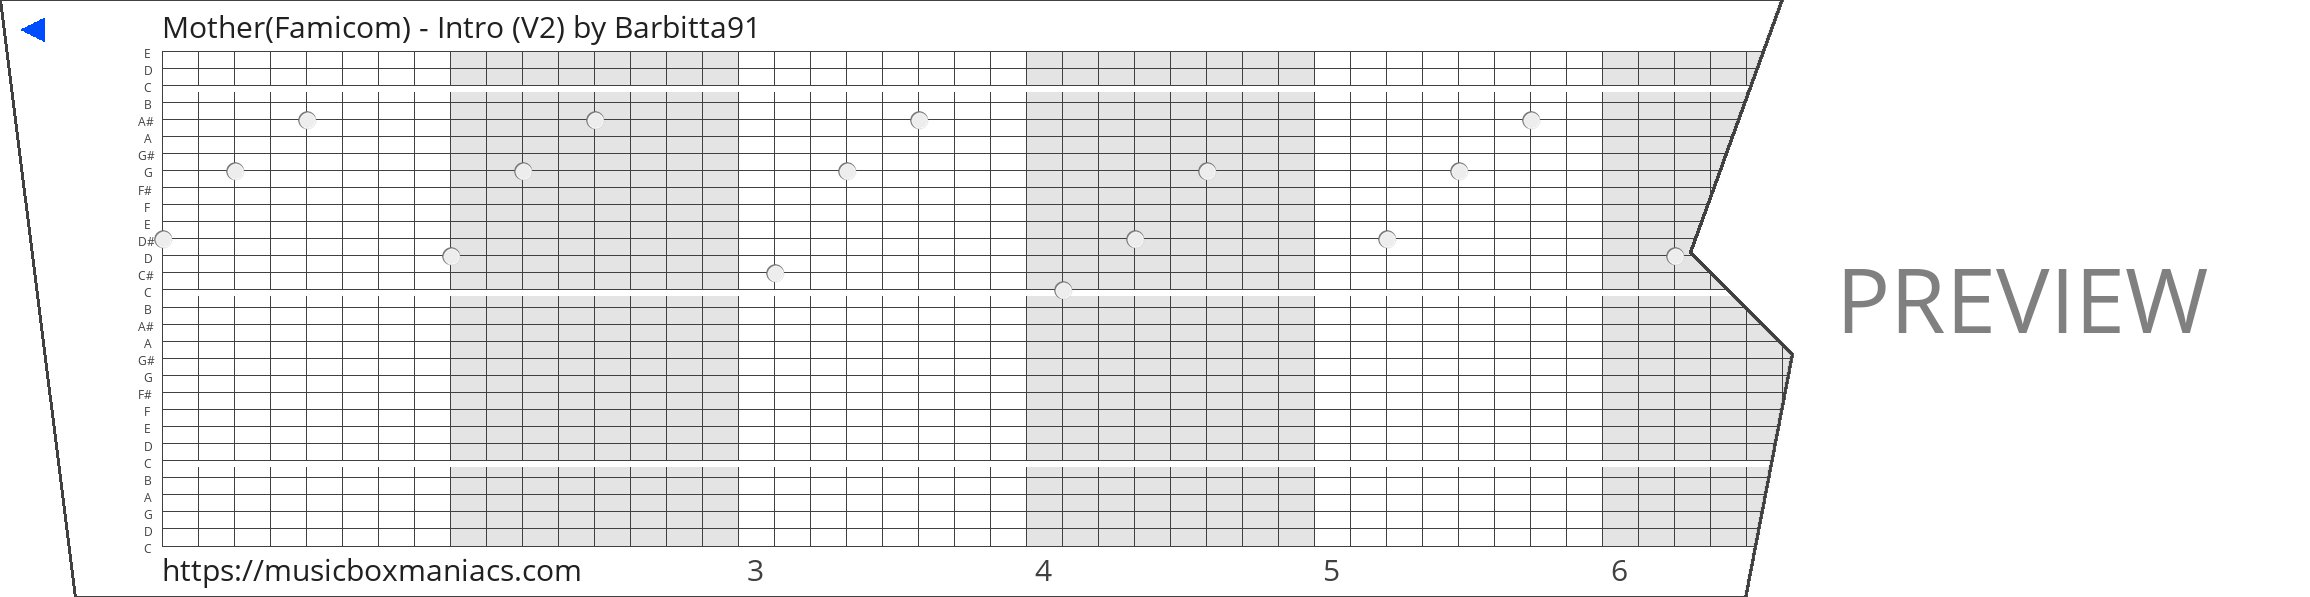 Mother(Famicom) - Intro (V2) 30 note music box paper strip